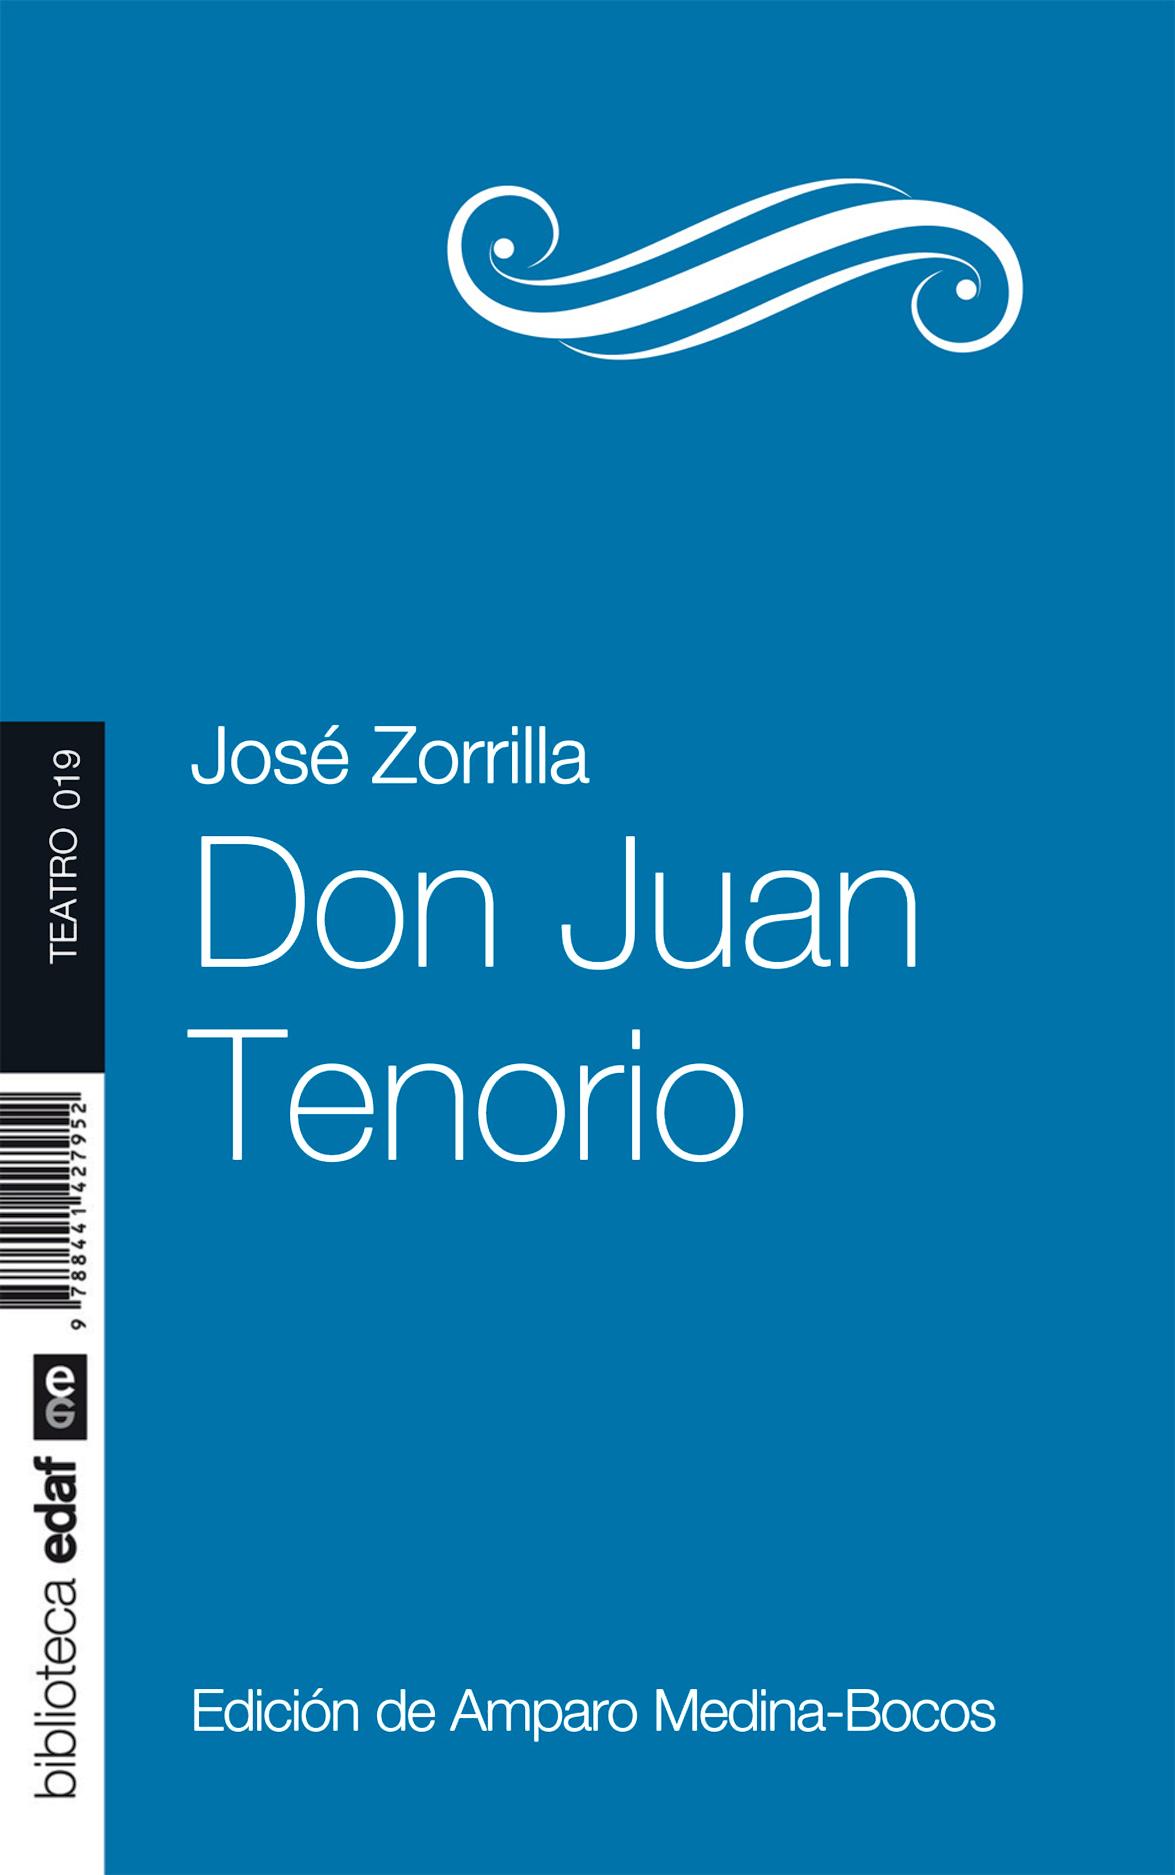 essay questions don juan tenorio Lorenzo da ponte one-act libretto by giovanni bertati called don giovanni tenorio and don juan tenorio by constructed essay explaining • sample questions.